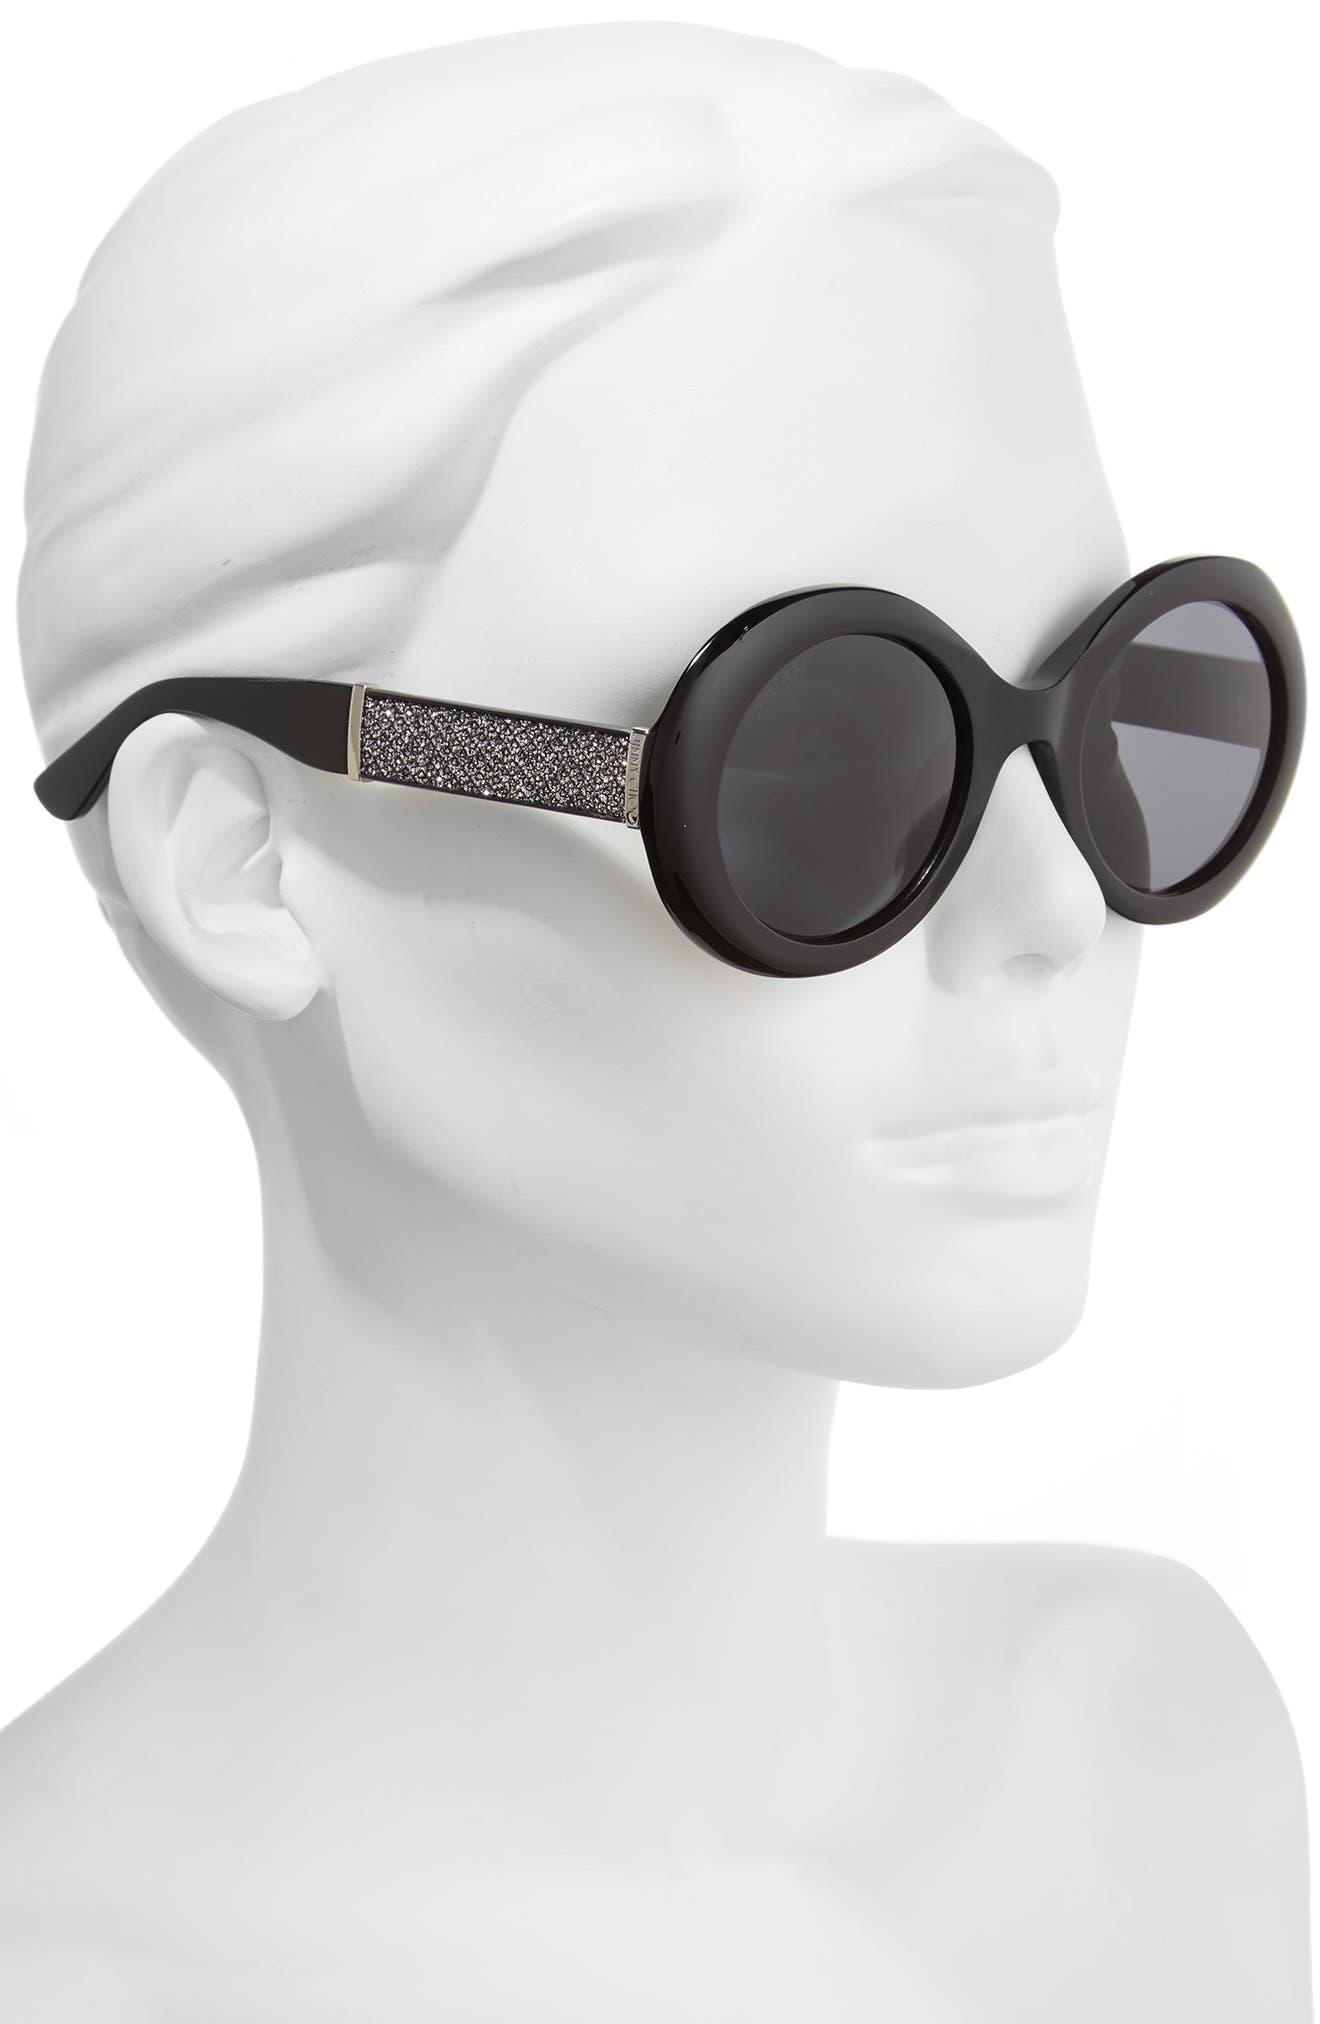 Wendy 51mm Round Sunglasses,                             Alternate thumbnail 2, color,                             Black/ Glitter/ Black